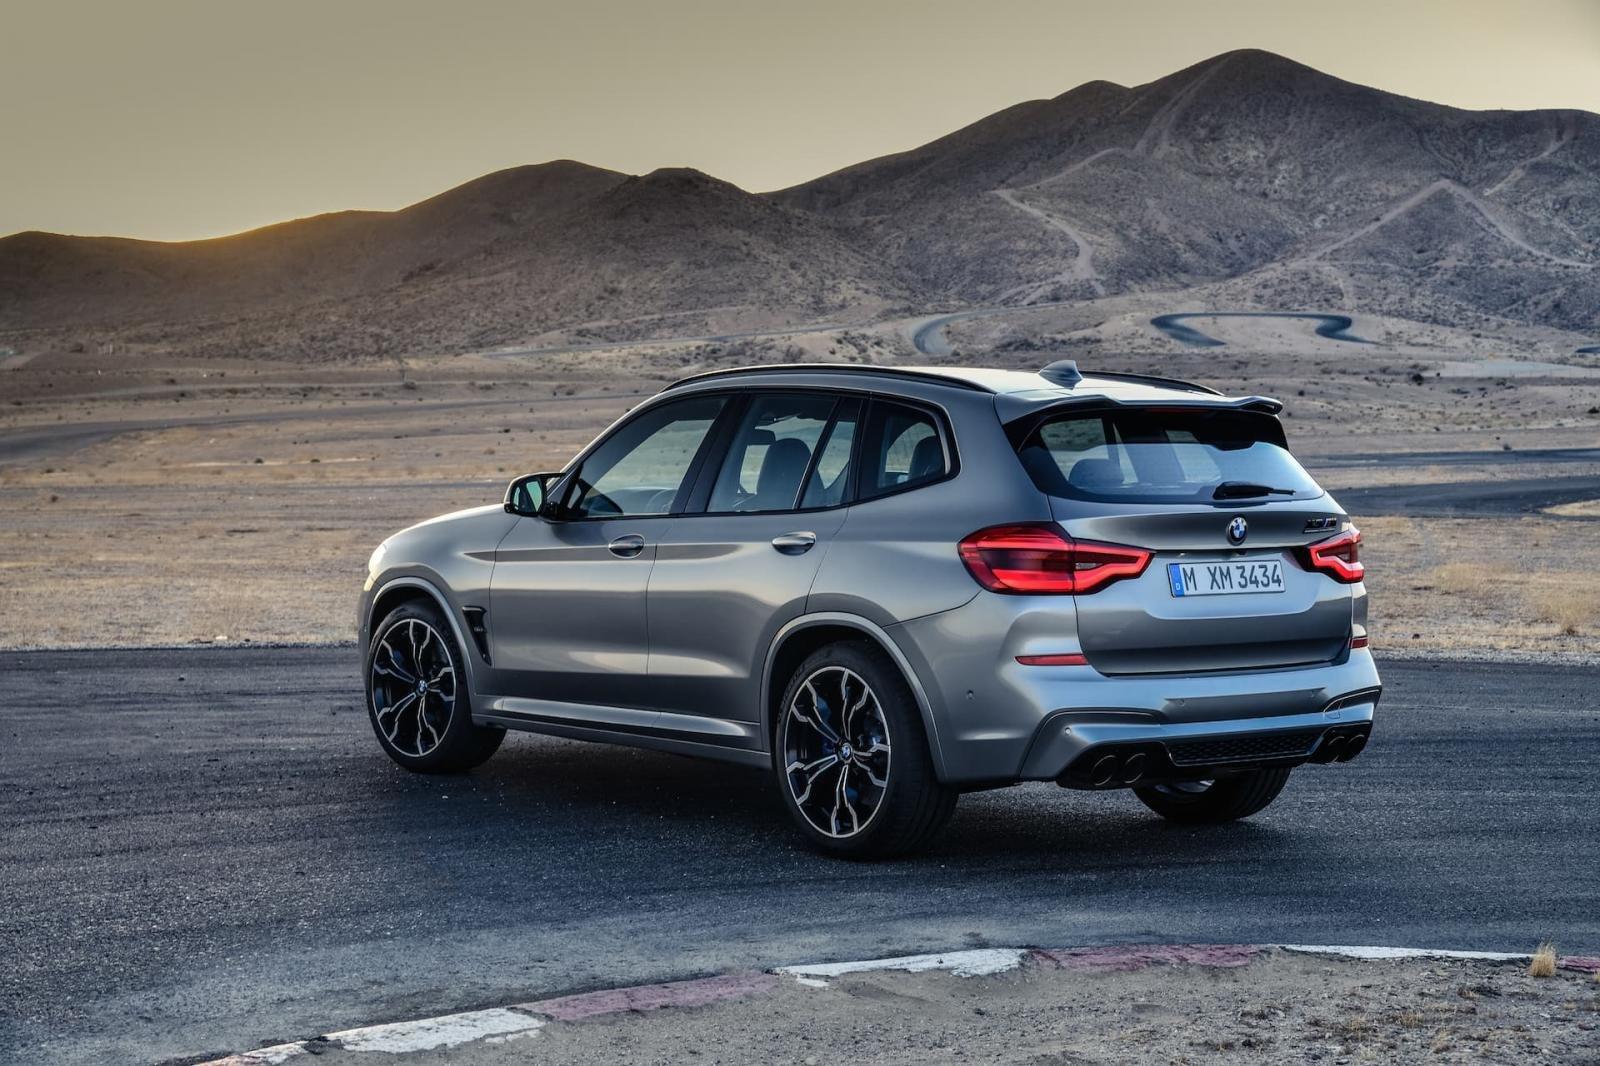 Mercedes-Benz GLC 300 4Matic 2020 BMW X3 xDrive30i 2020 comparativa